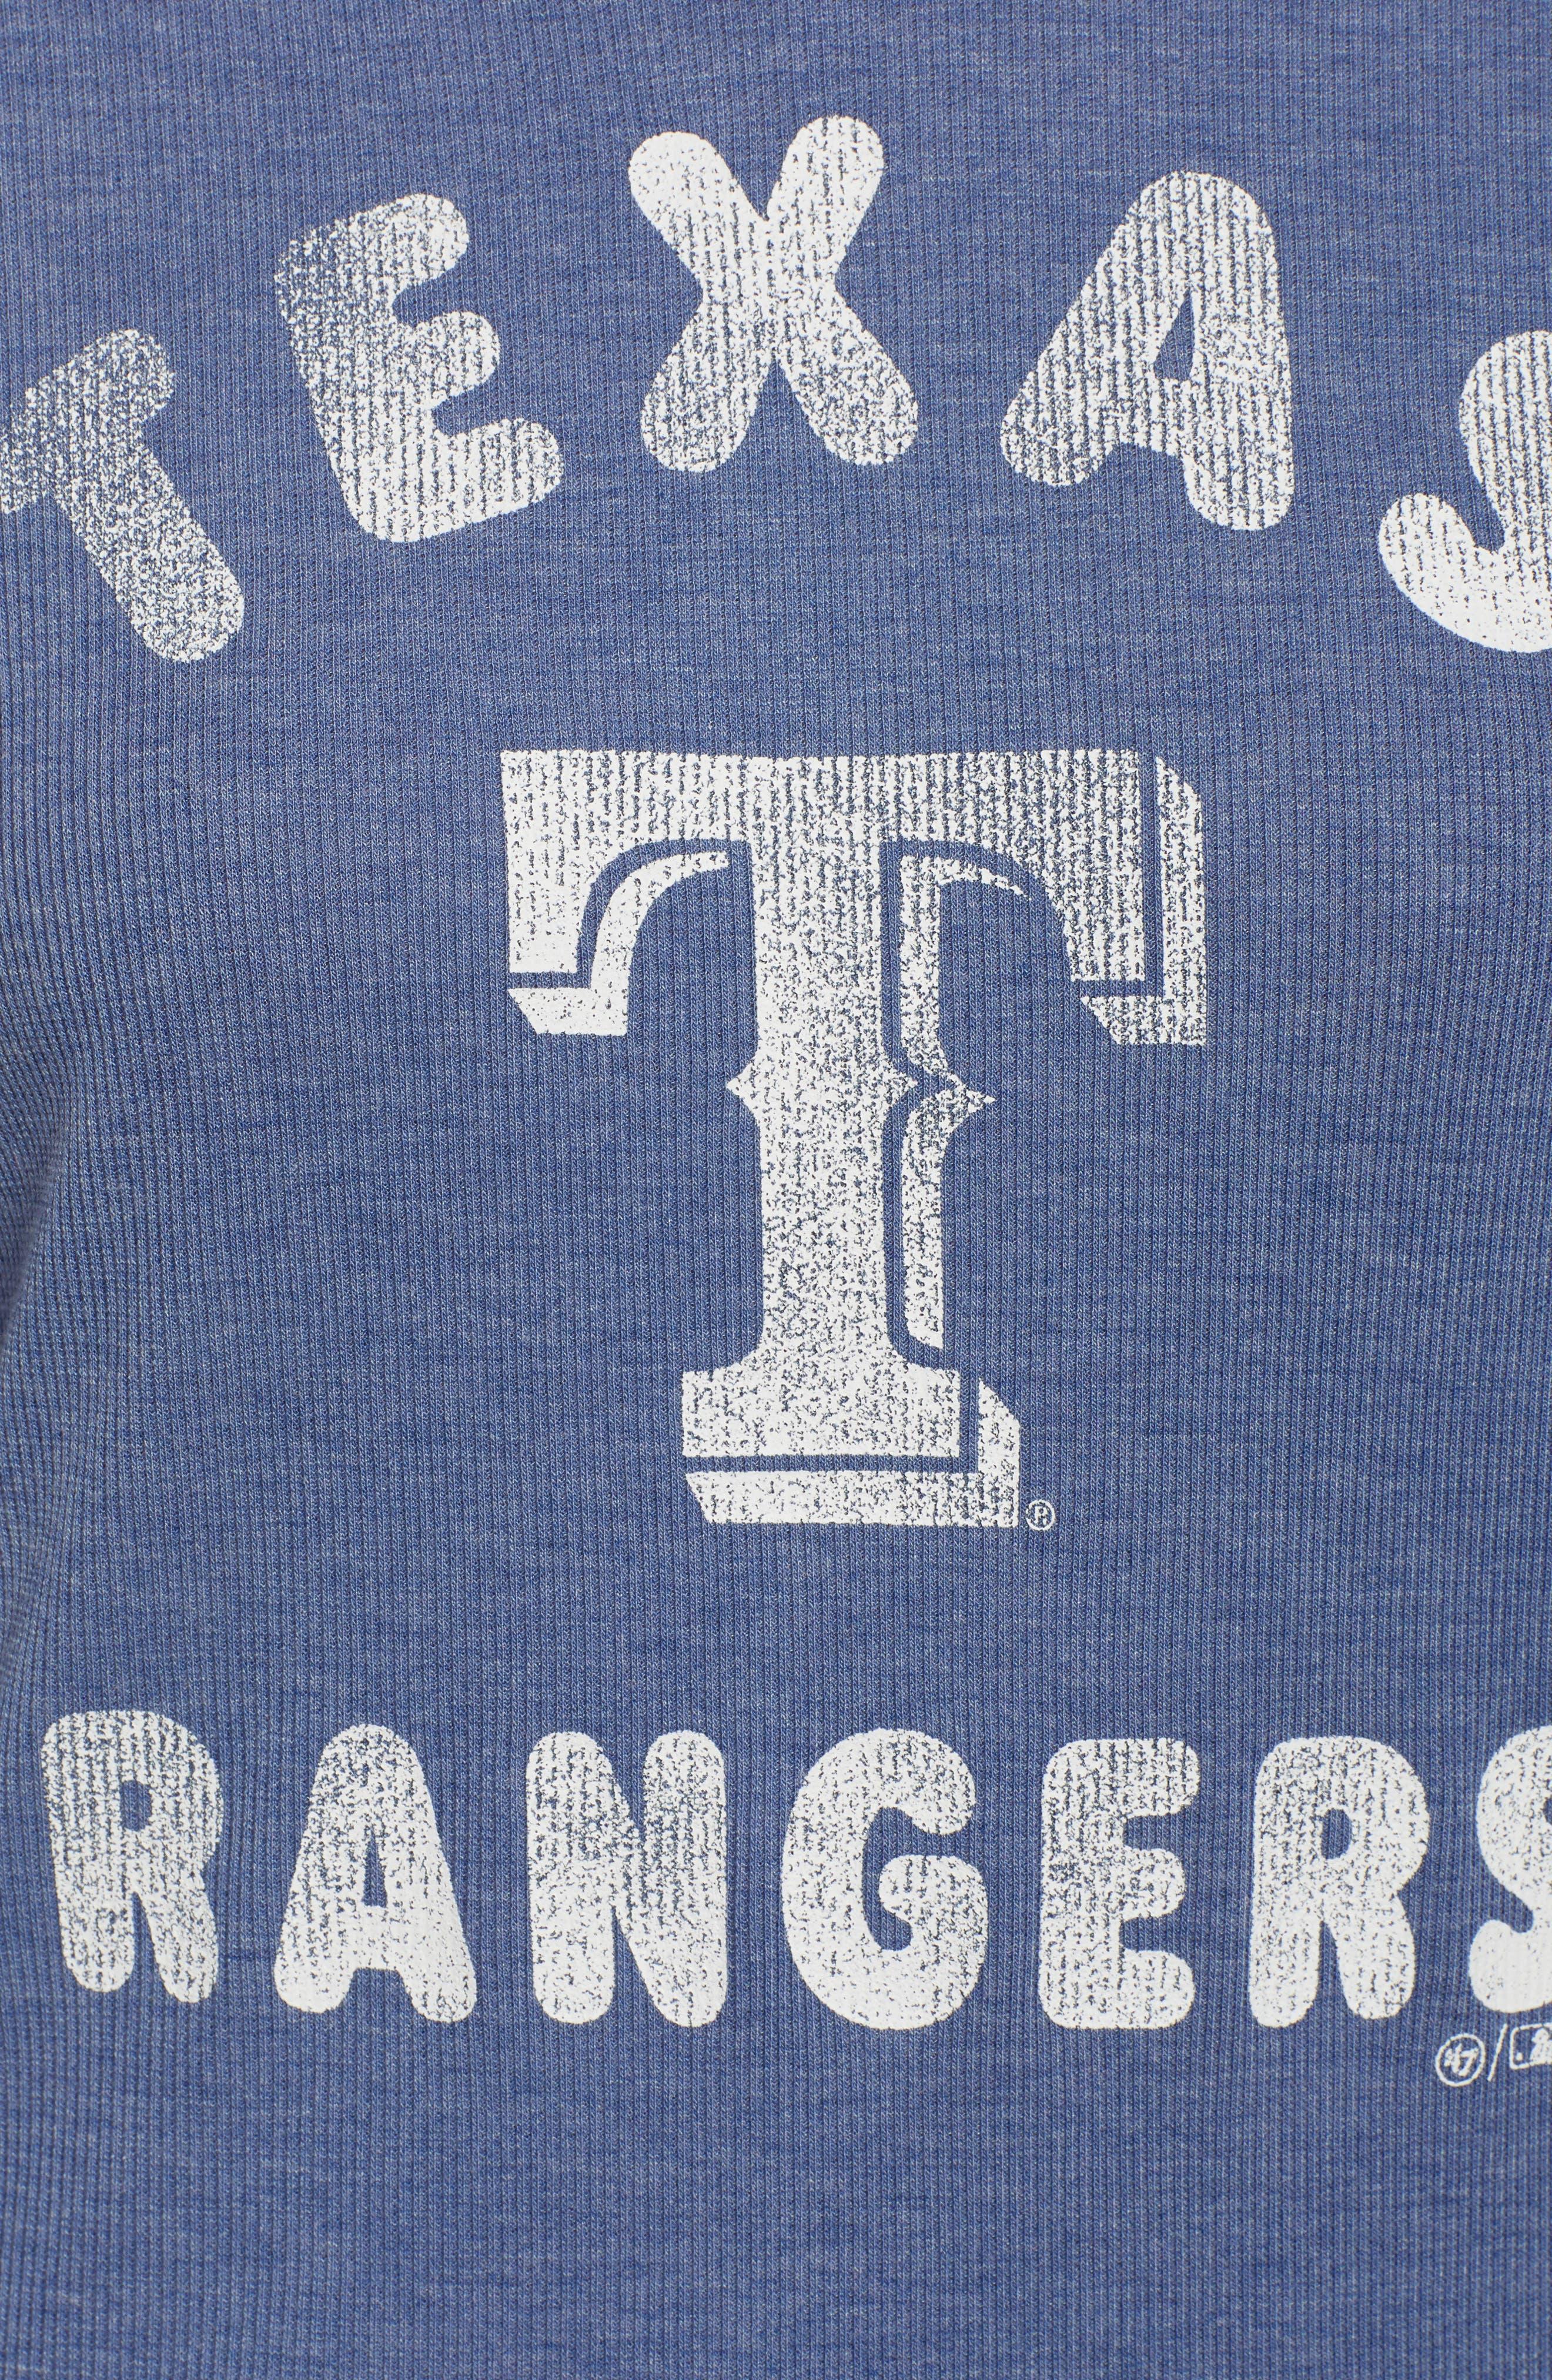 Campbell Texas Rangers Rib Knit Hooded Top,                             Alternate thumbnail 6, color,                             Bleacher Blue